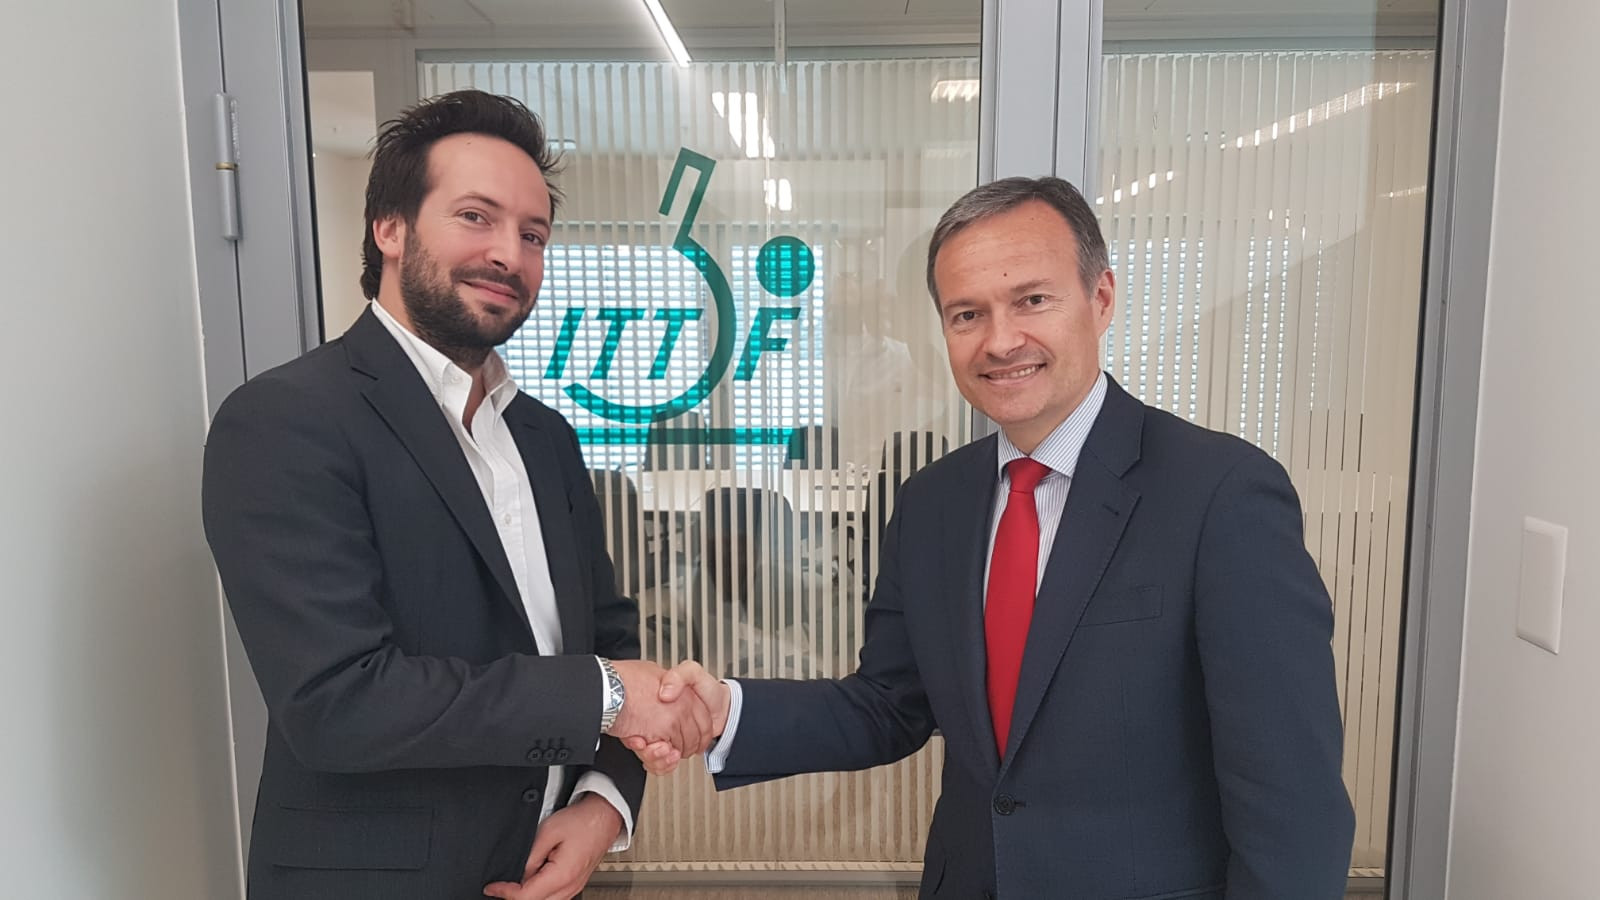 ITTF secretary general Raul Calin, right, and ITA director general, Benjamin Cohen after signing an agreement ©ITTF